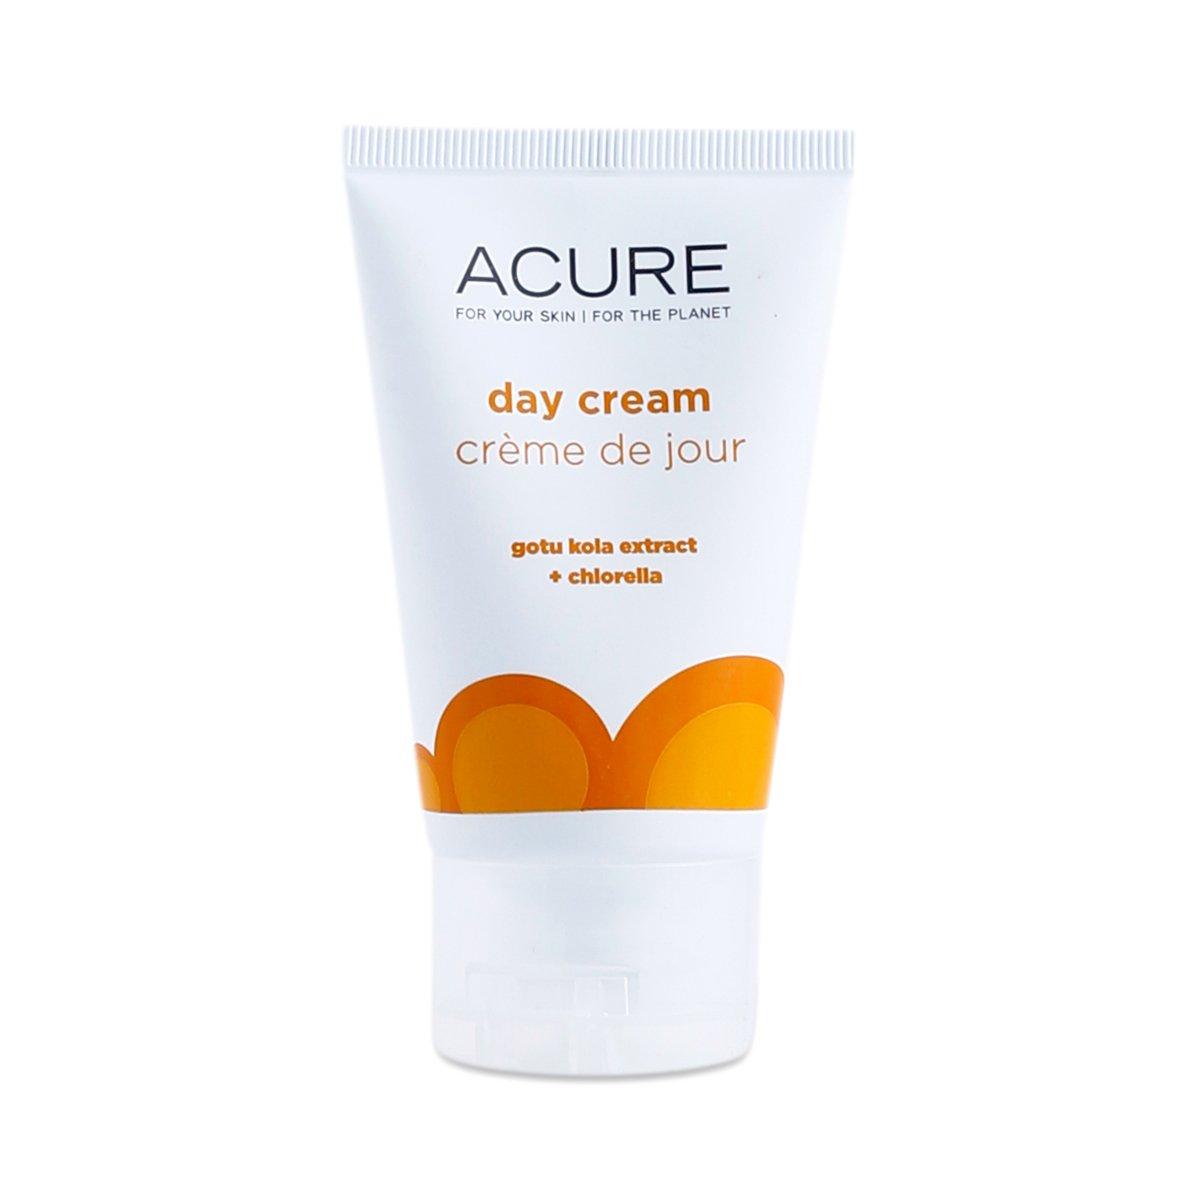 ACURE Day Cream 1 fl oz / 30 ml - travel size